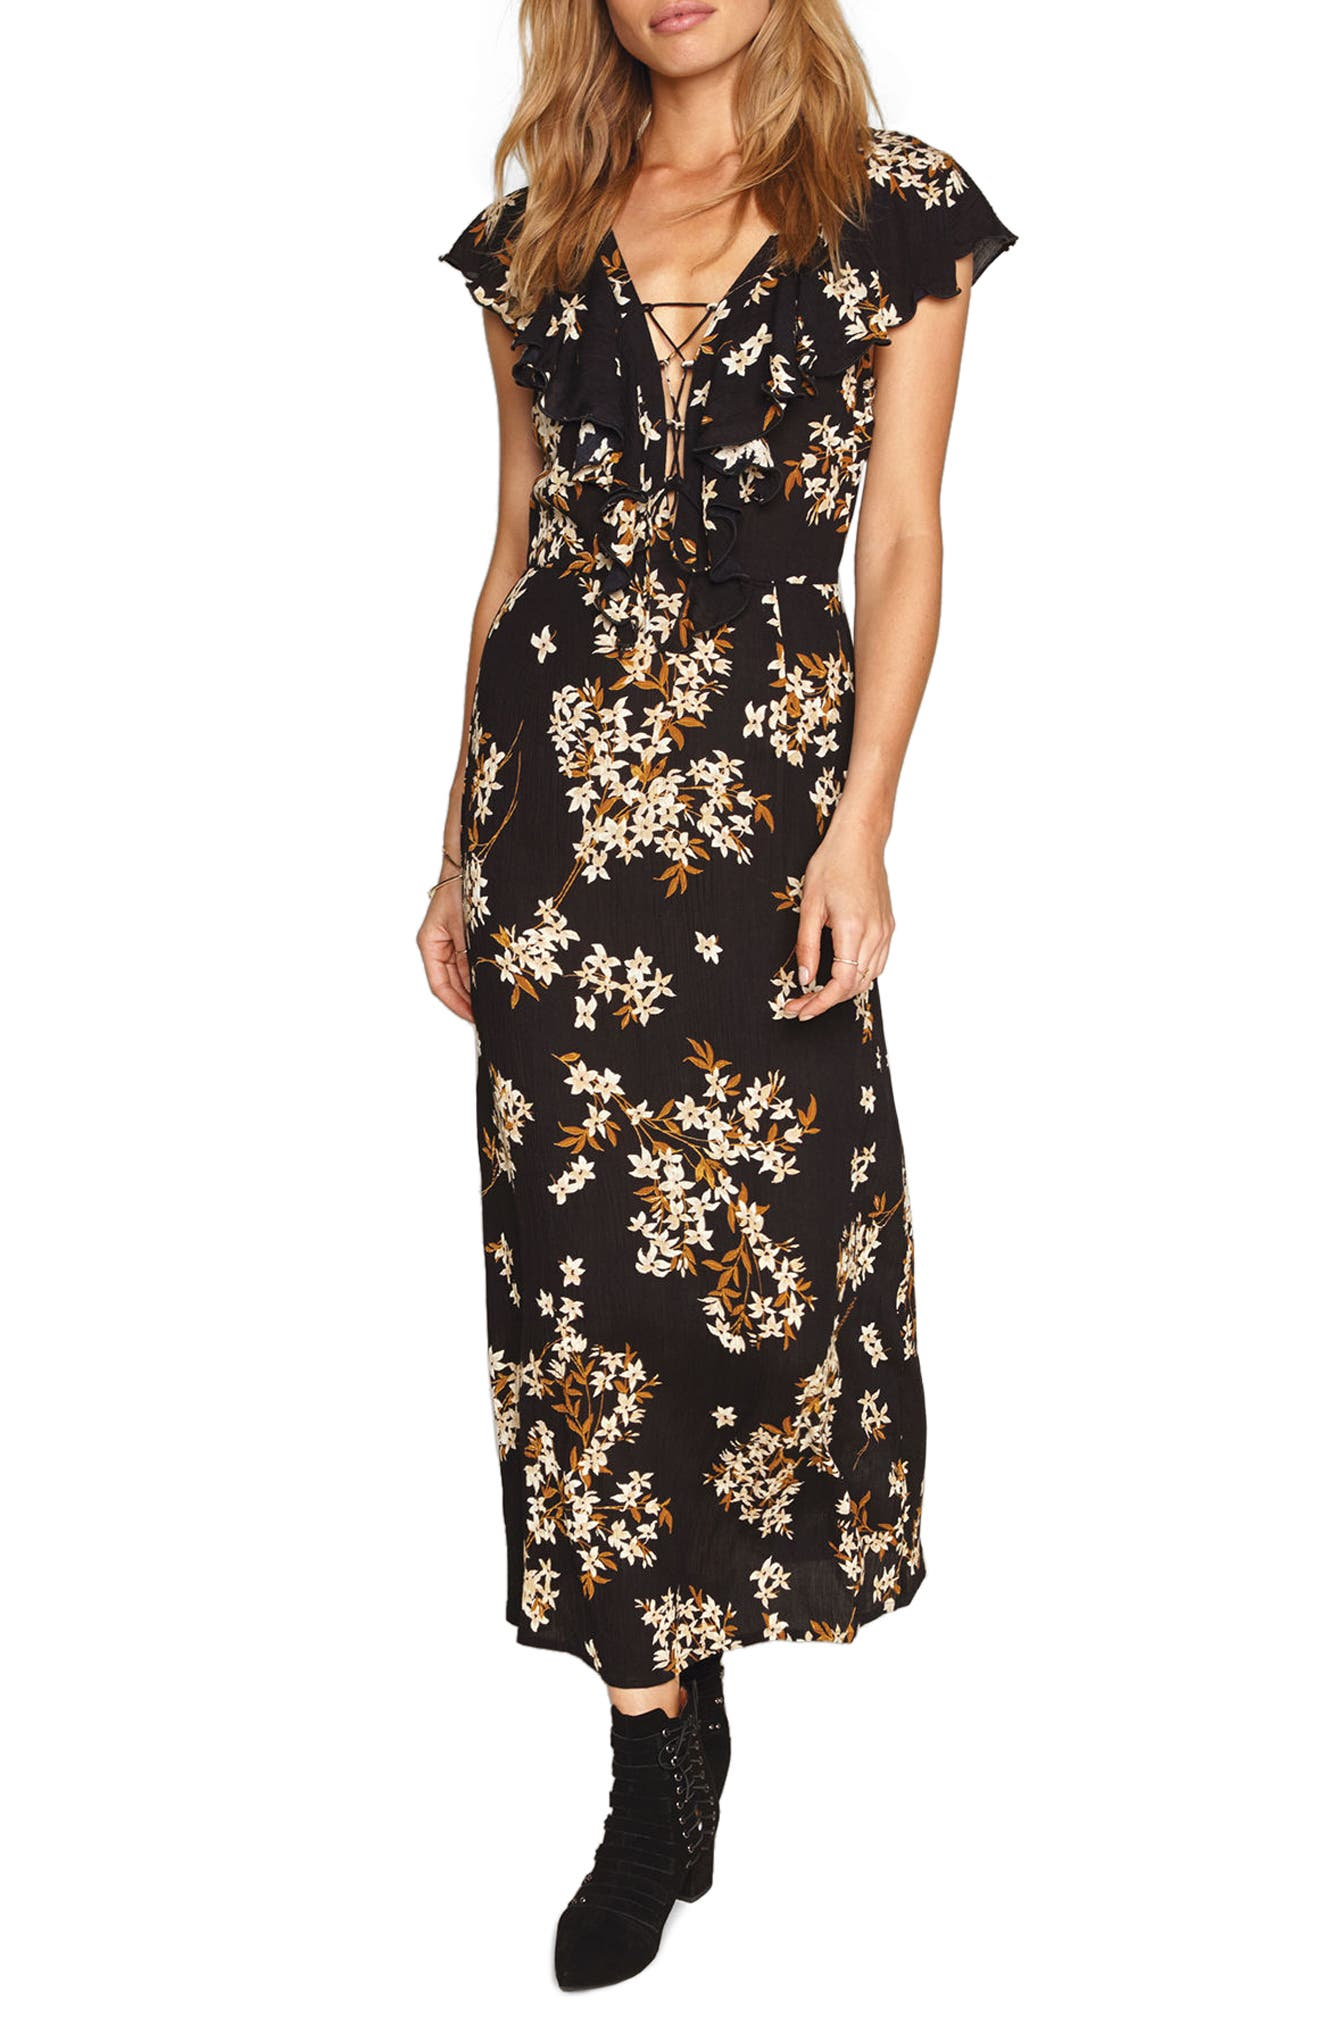 Alana Floral Lace-Up Dress,                             Main thumbnail 1, color,                             001